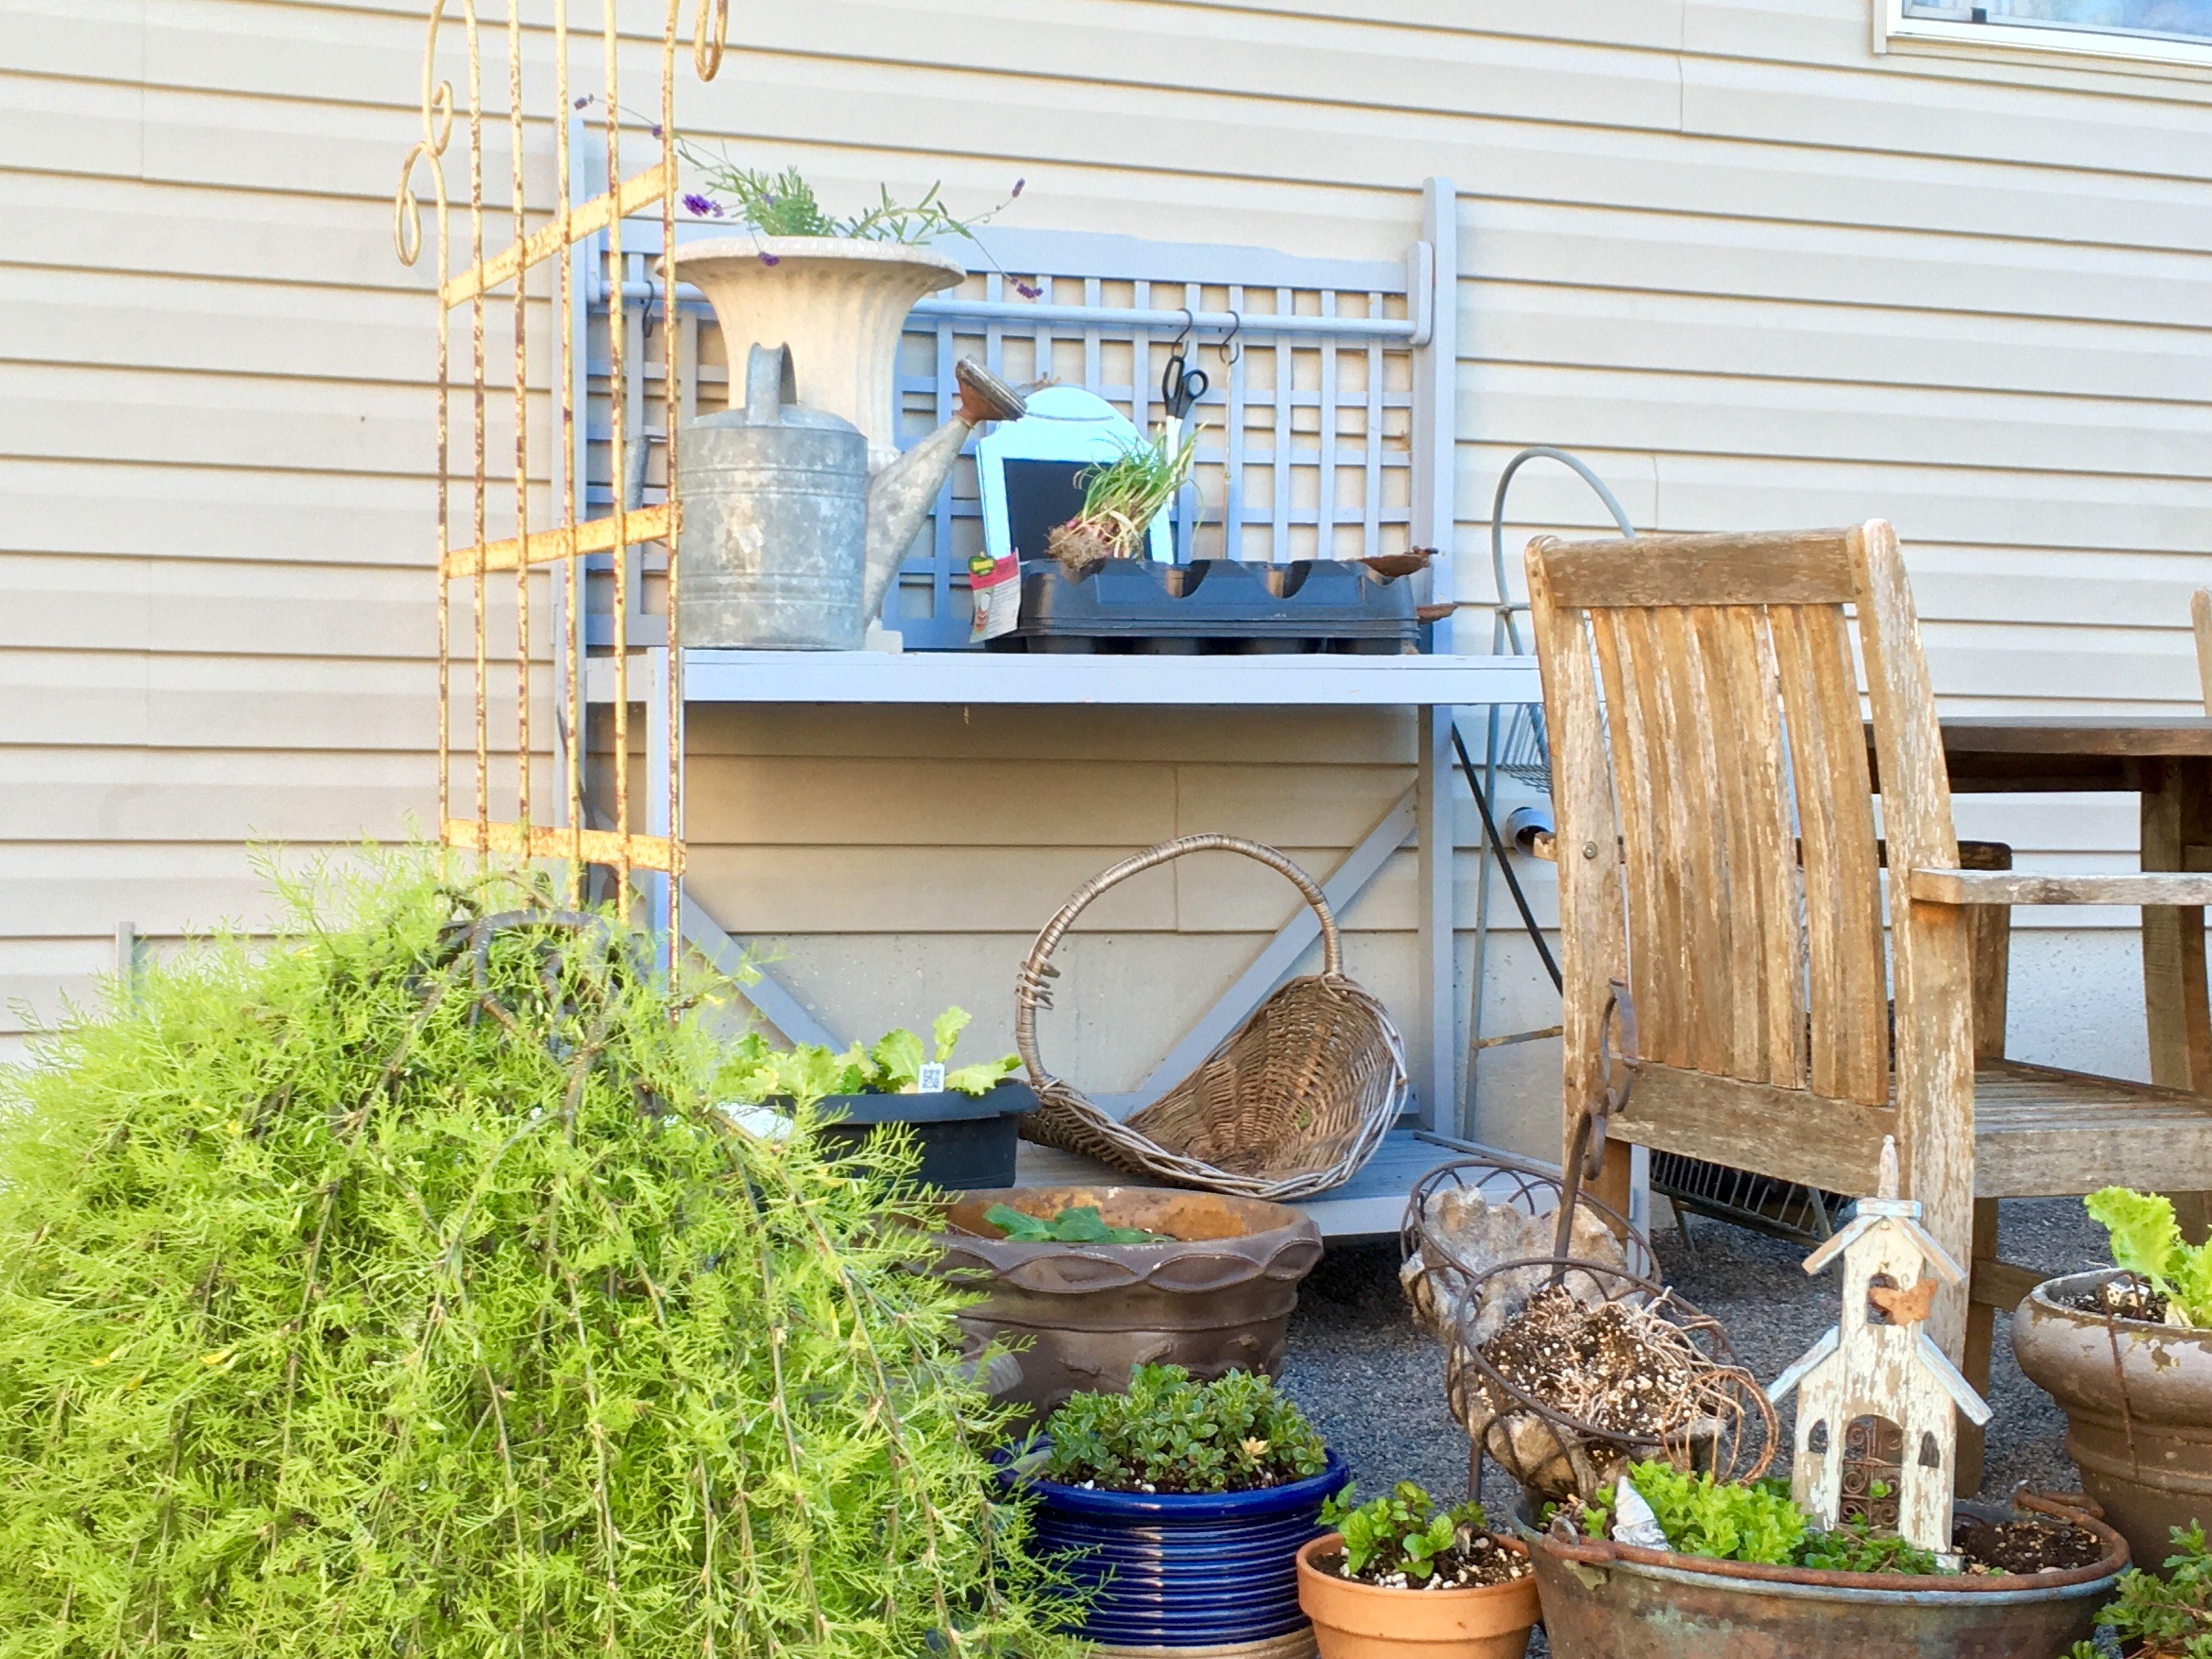 18 Fresh Craigslist Springfield Mo Farm and Garden (With